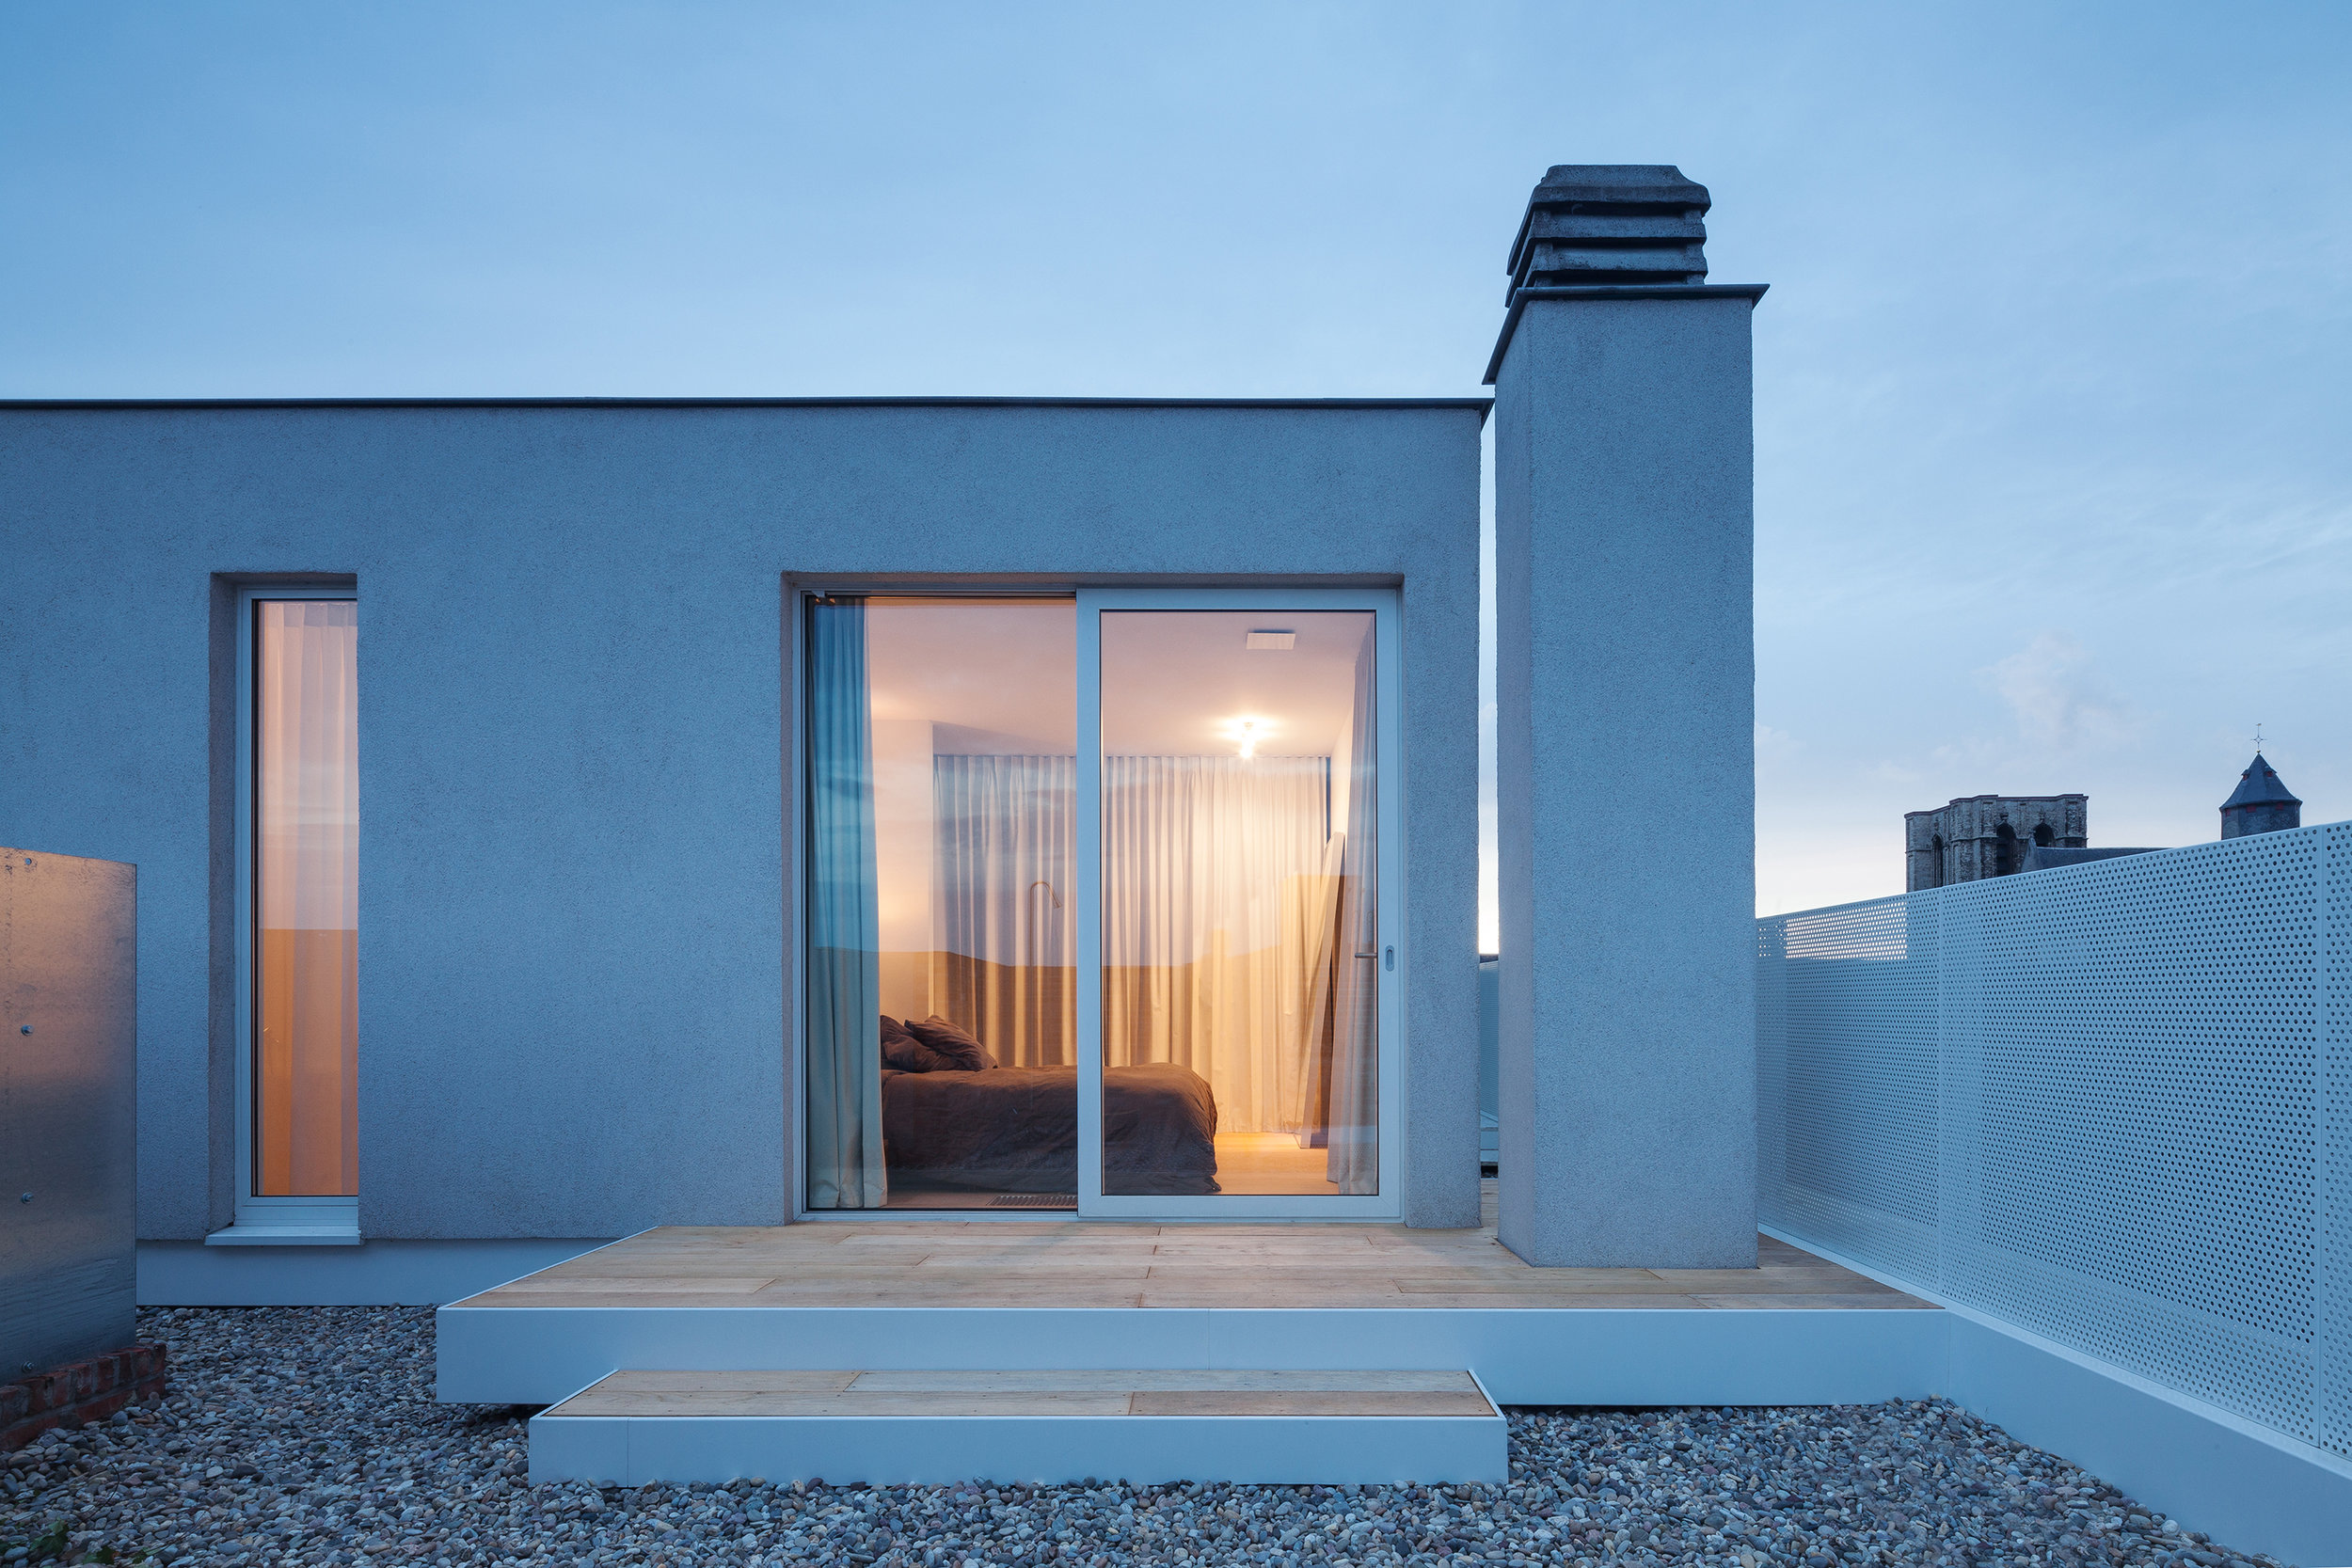 Penthouse, Gent